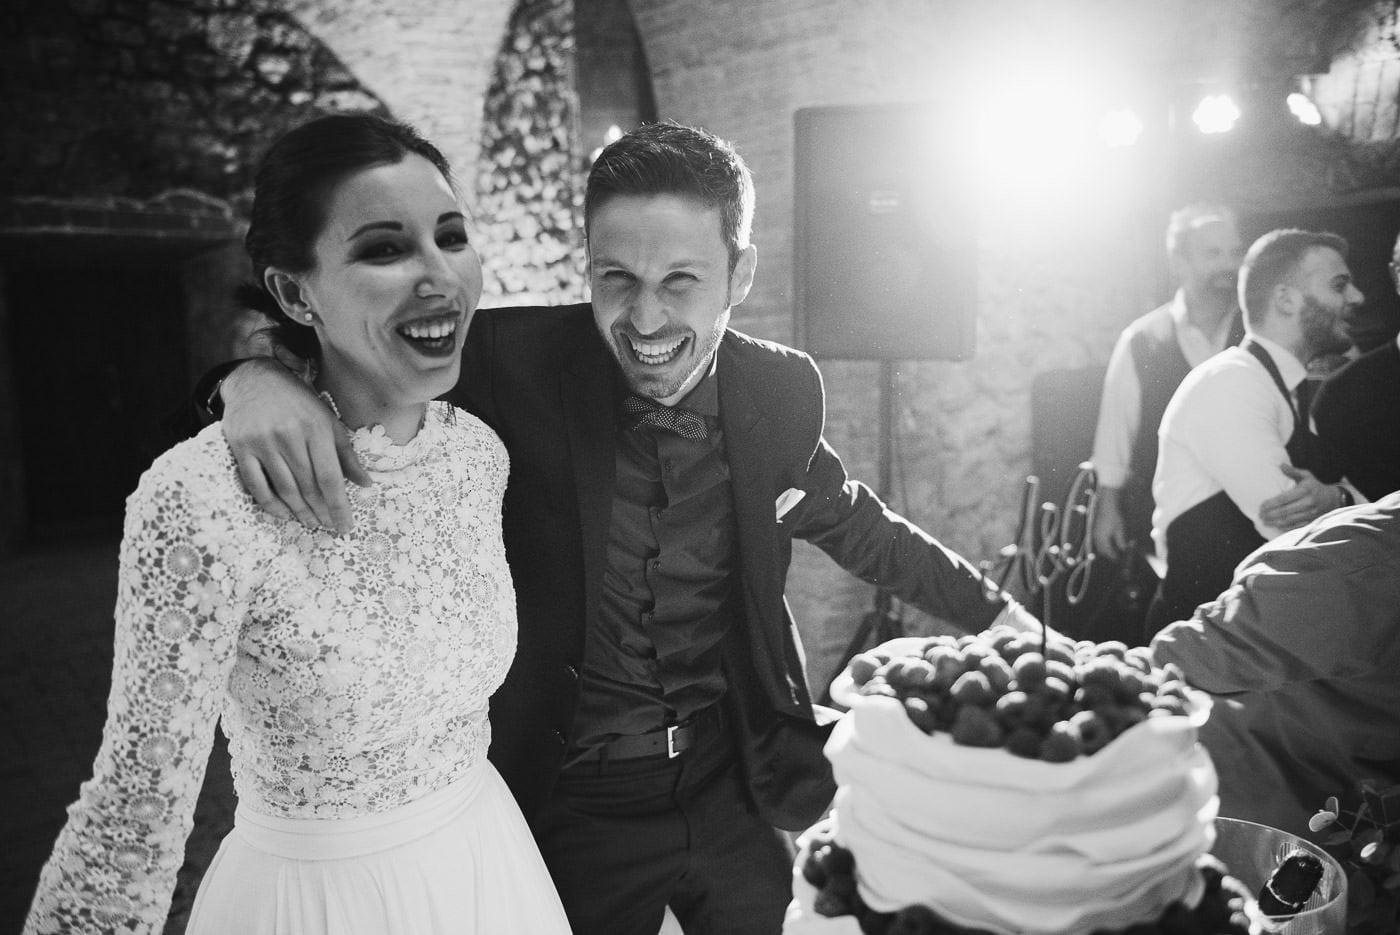 Matrimonio Giulia & Alessandro 28_12 – Alessio Nobili Photographer-66